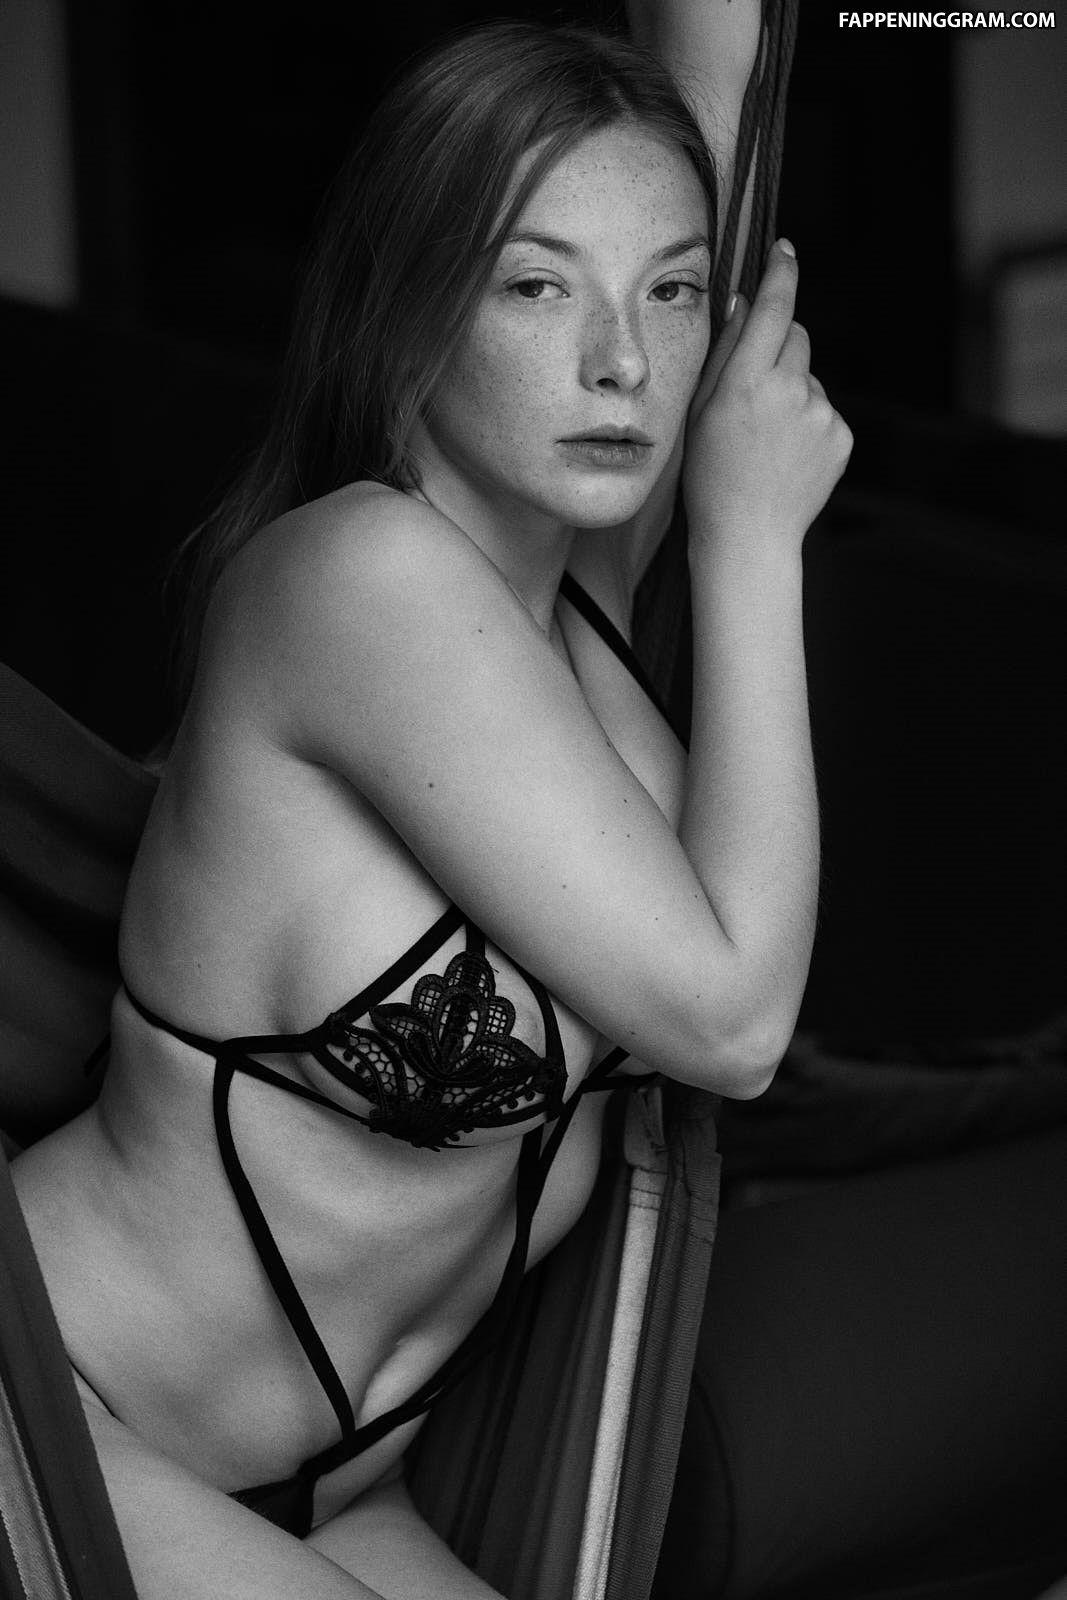 Olga Kobzar Nude The Fappening - FappeningGram